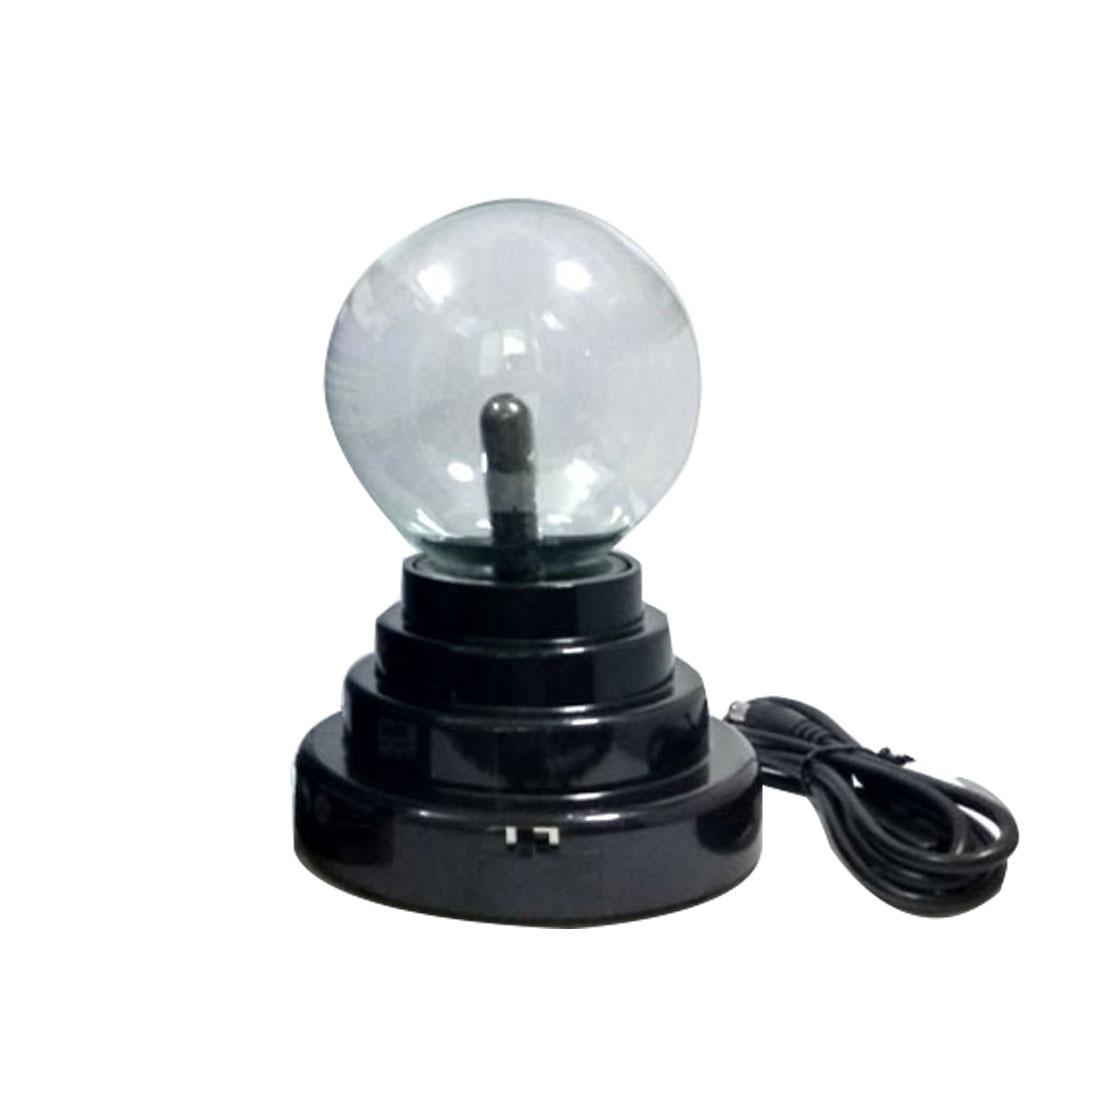 Party Lamp Light USB Magic Black Base Glass Plasma Ball Sphere Lightning ac powered plasma ball red light lightning sphere 220v eu plug